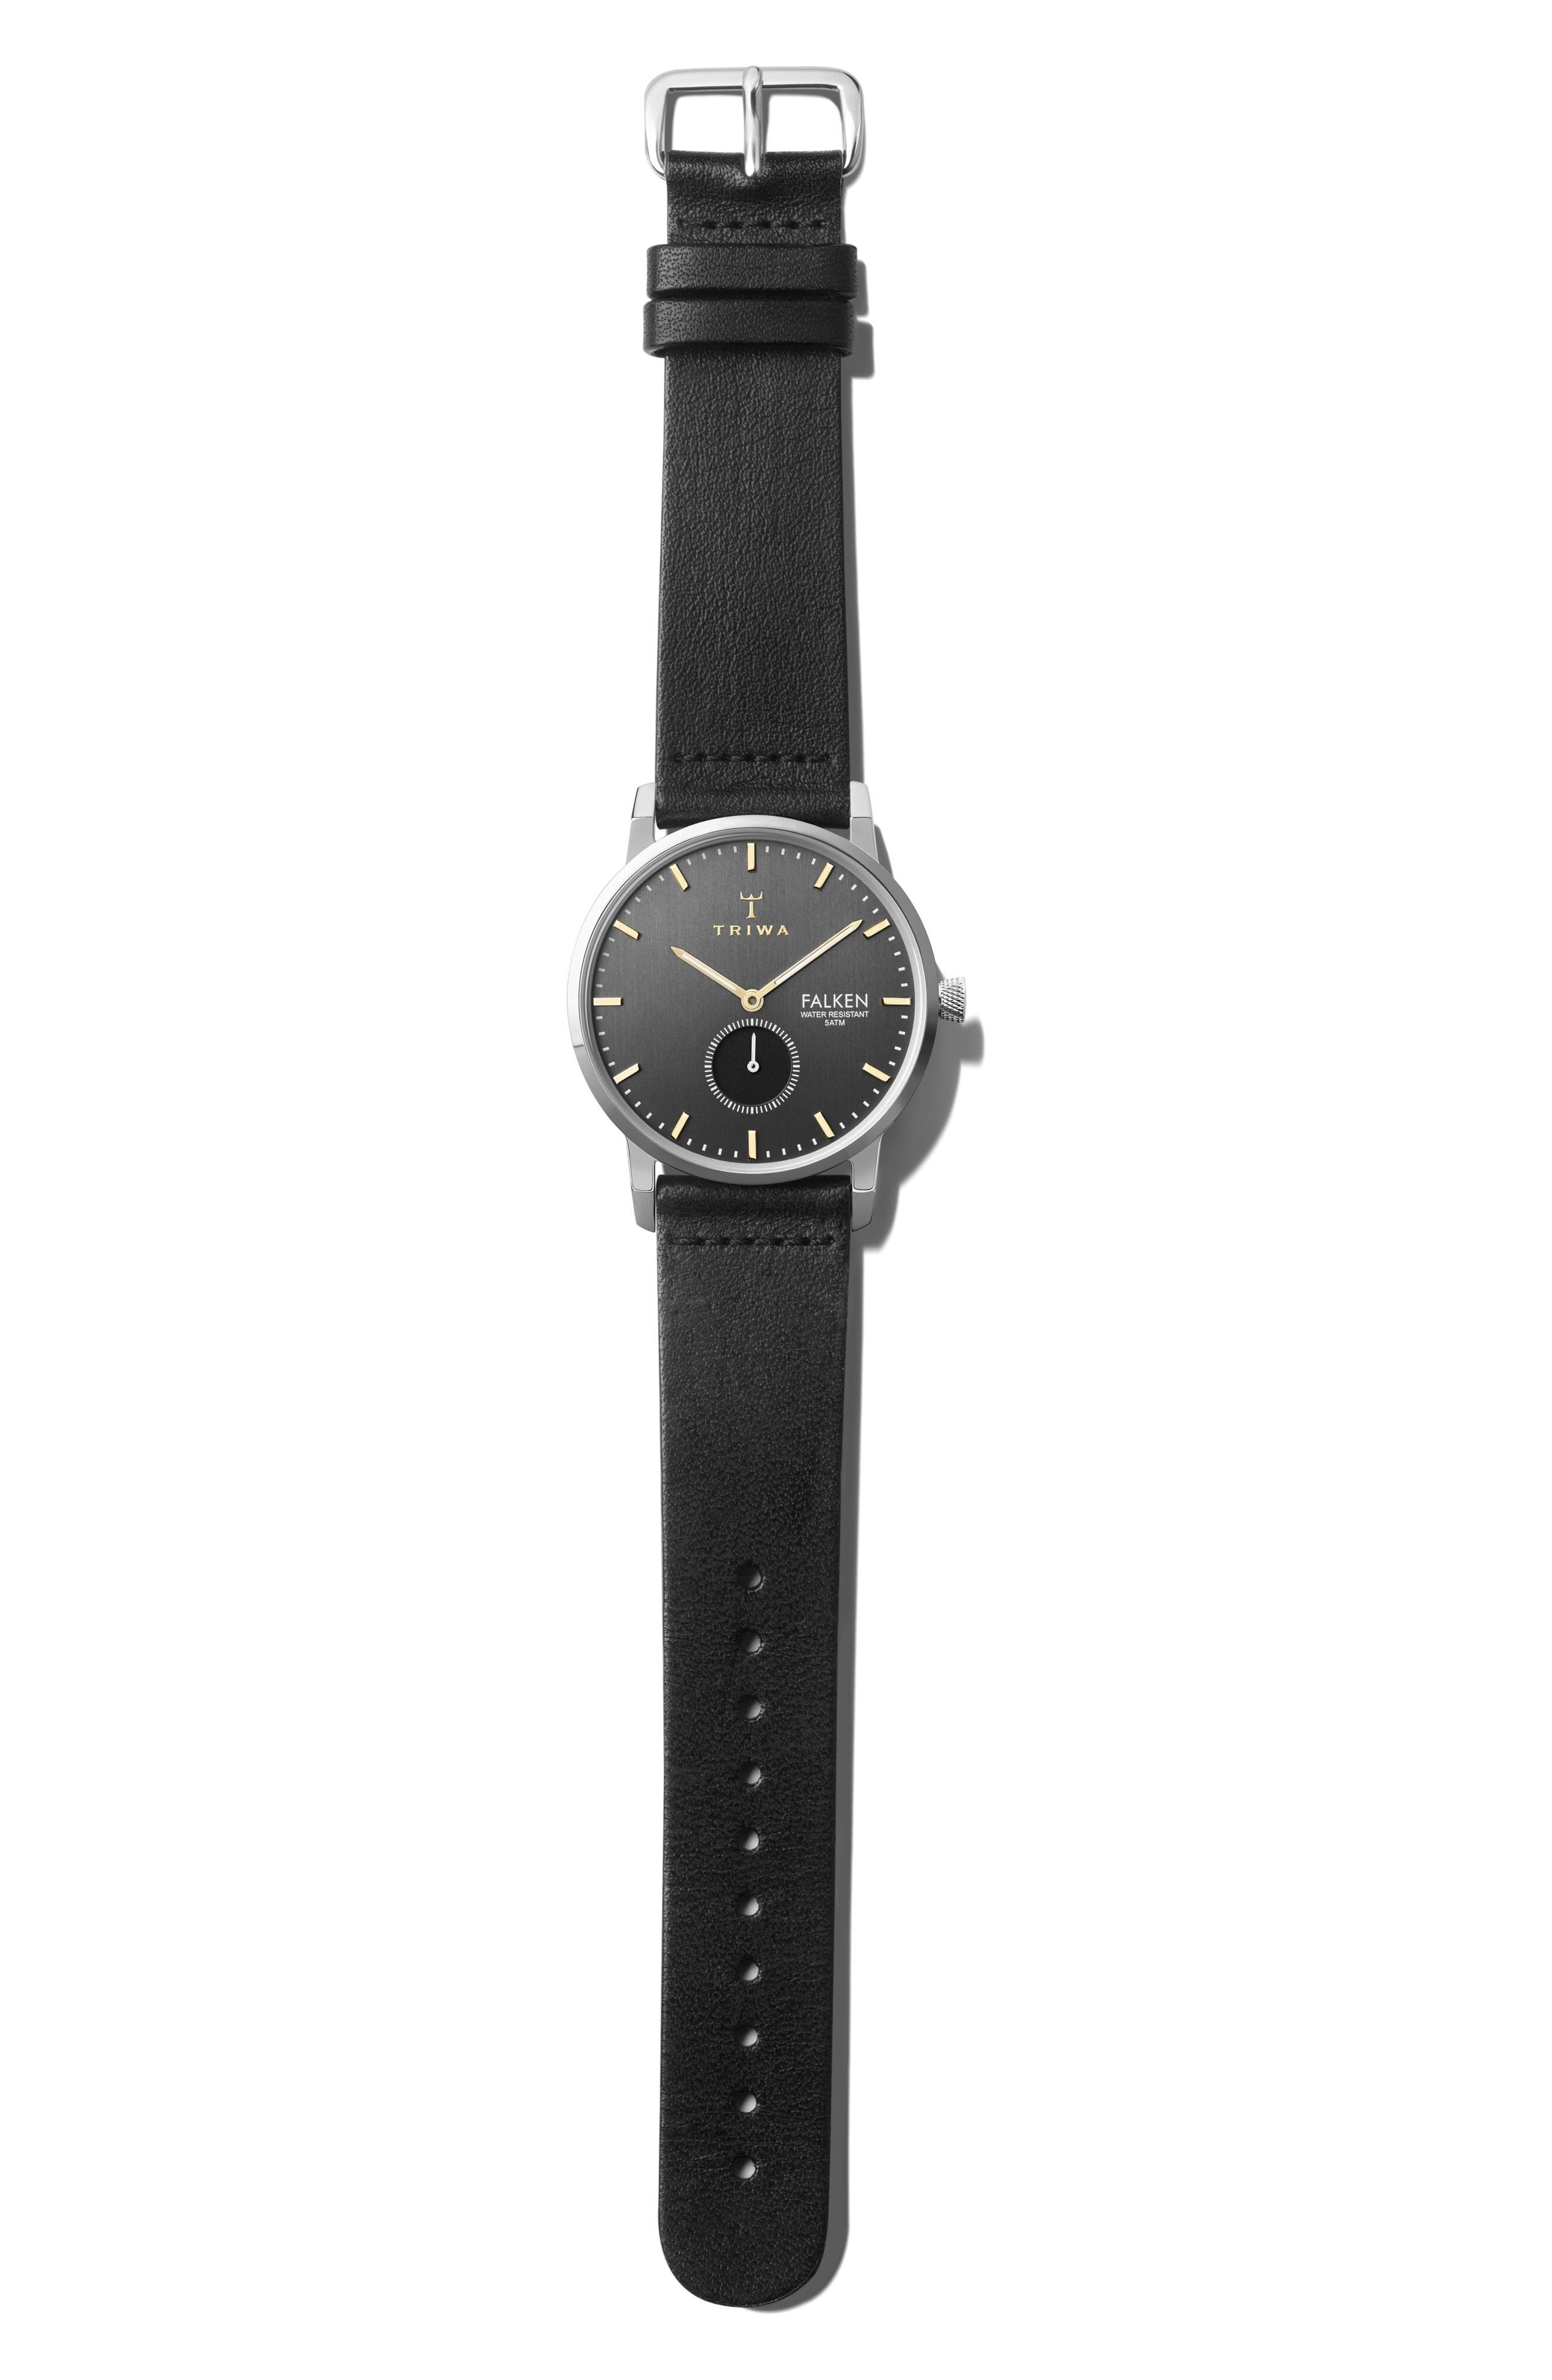 TRIWA Smoky Falken Leather Strap Watch, 38Mm in Black/ Grey/ Silver